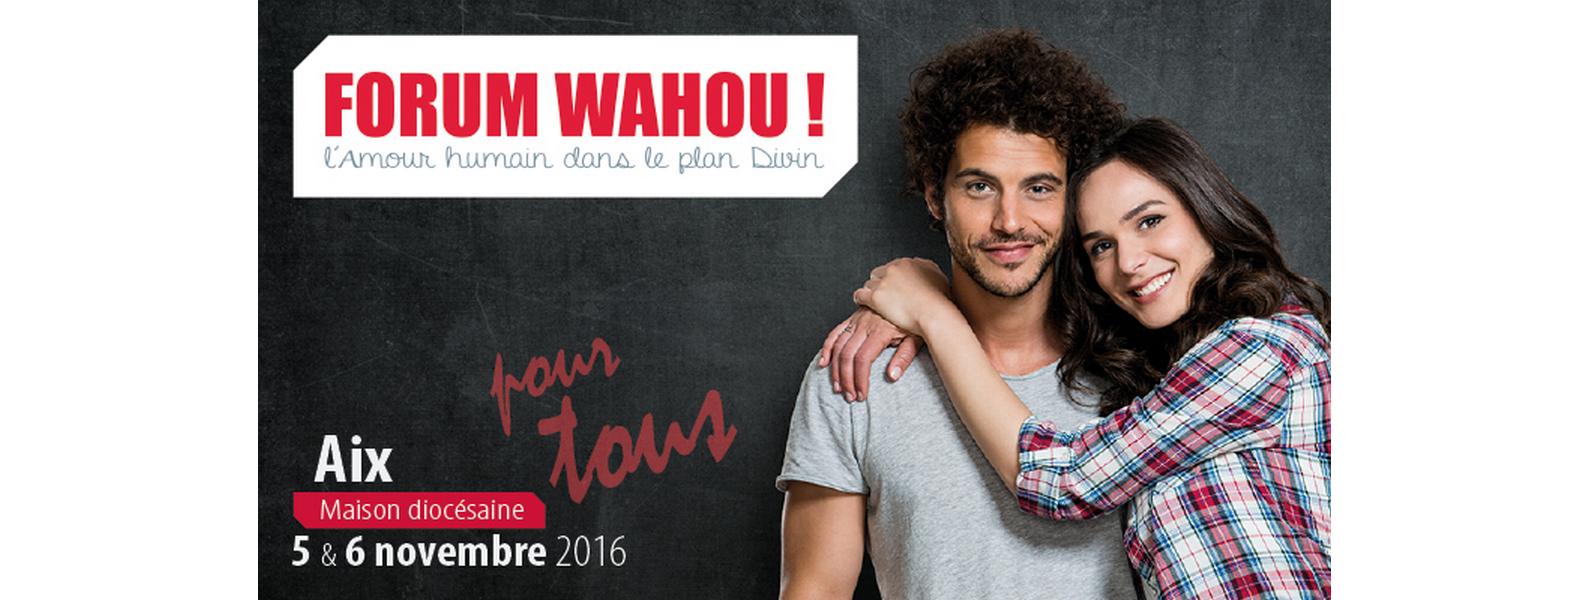 2016-11-05-Forum-Wahou